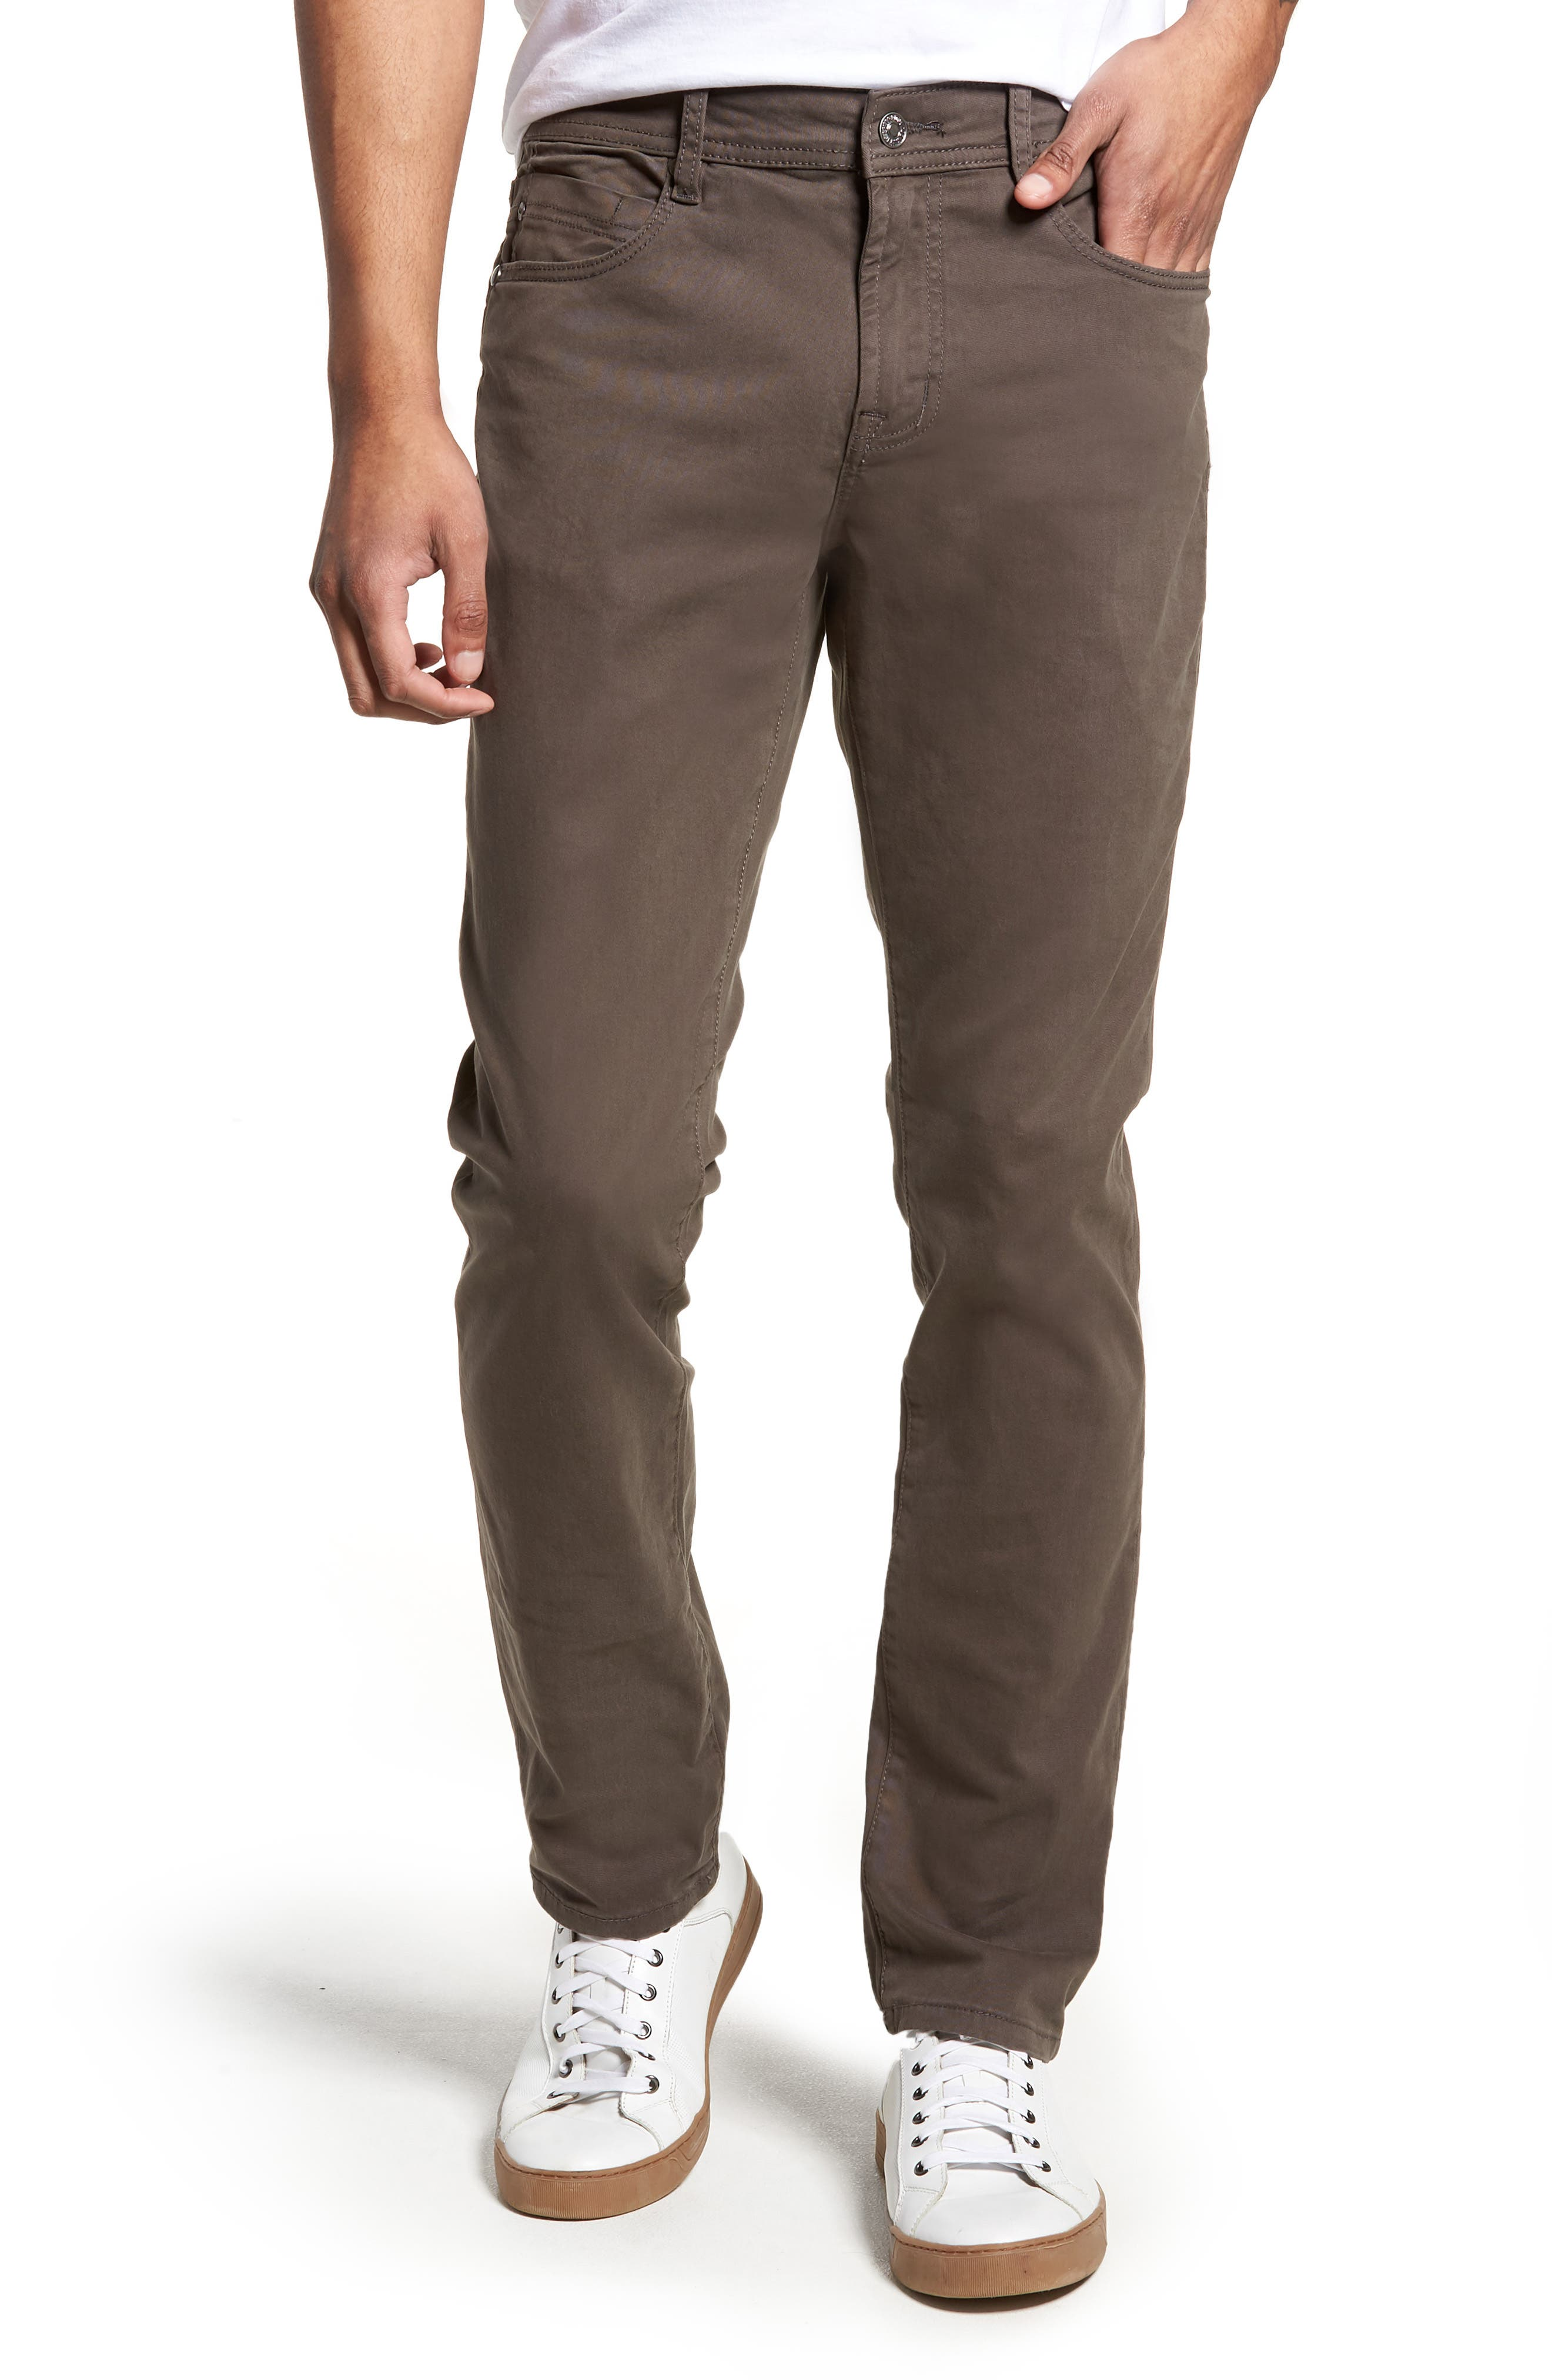 Jeans Co. Kingston Slim Straight Leg Jeans,                             Main thumbnail 1, color,                             Deep Earth